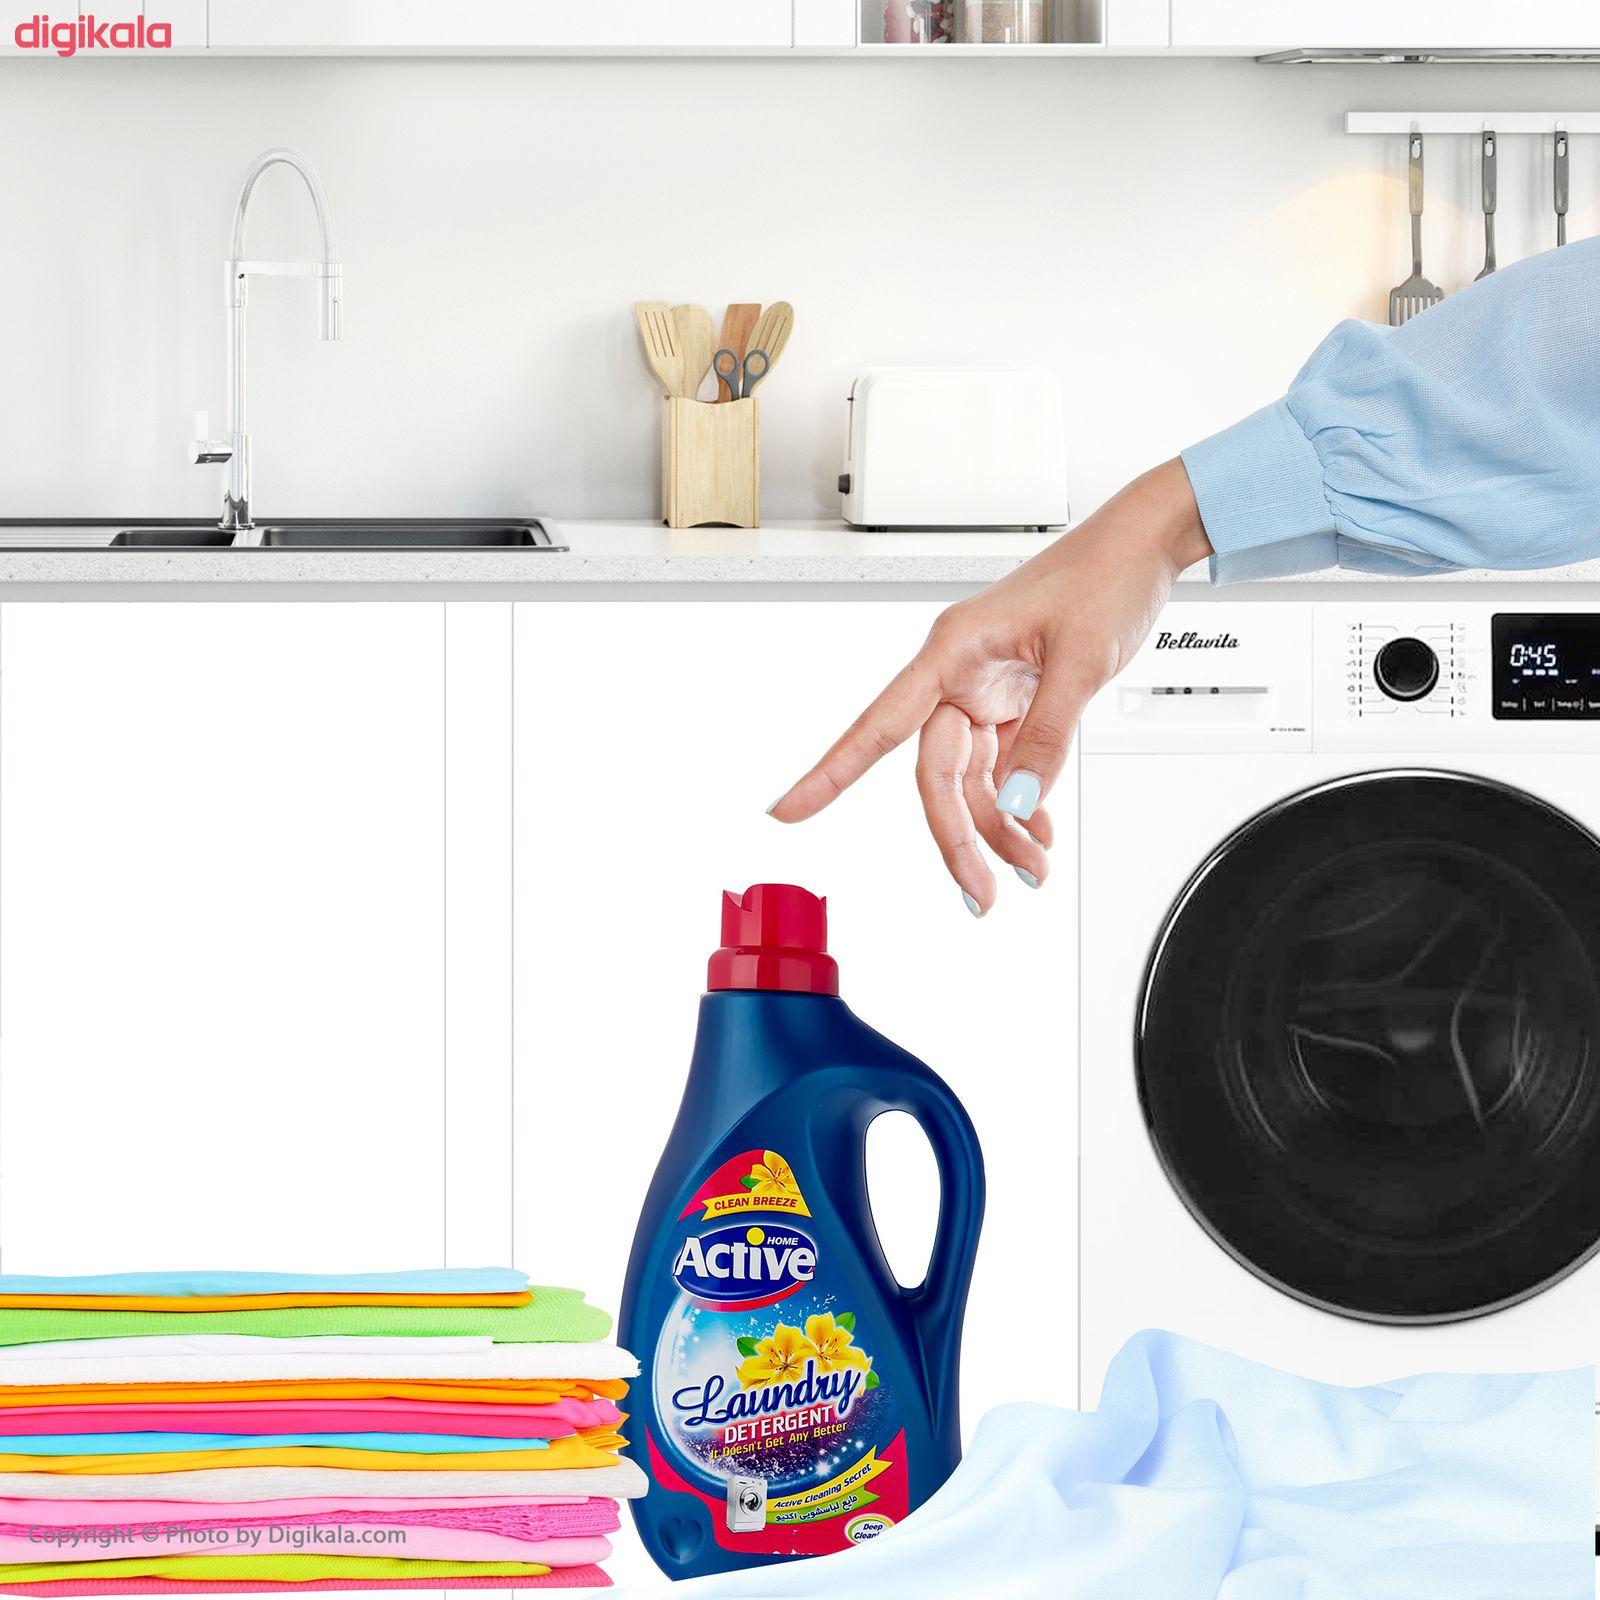 مایع لباسشویی سرخابی اکتیو 2500 گرم main 1 4